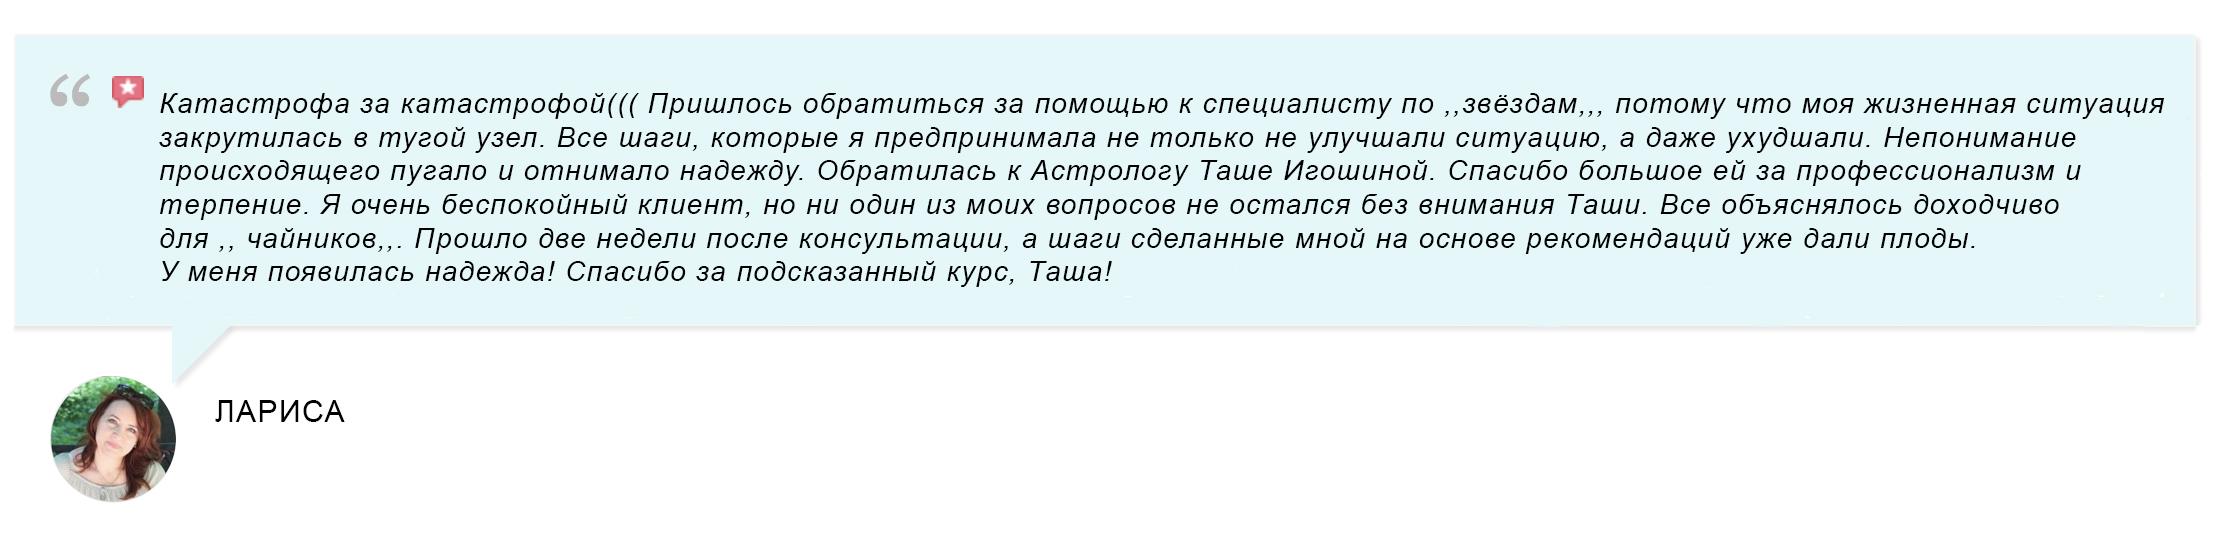 https://astrologtasha.ru/wp-content/uploads/2020/10/larisa_otzyv.jpg